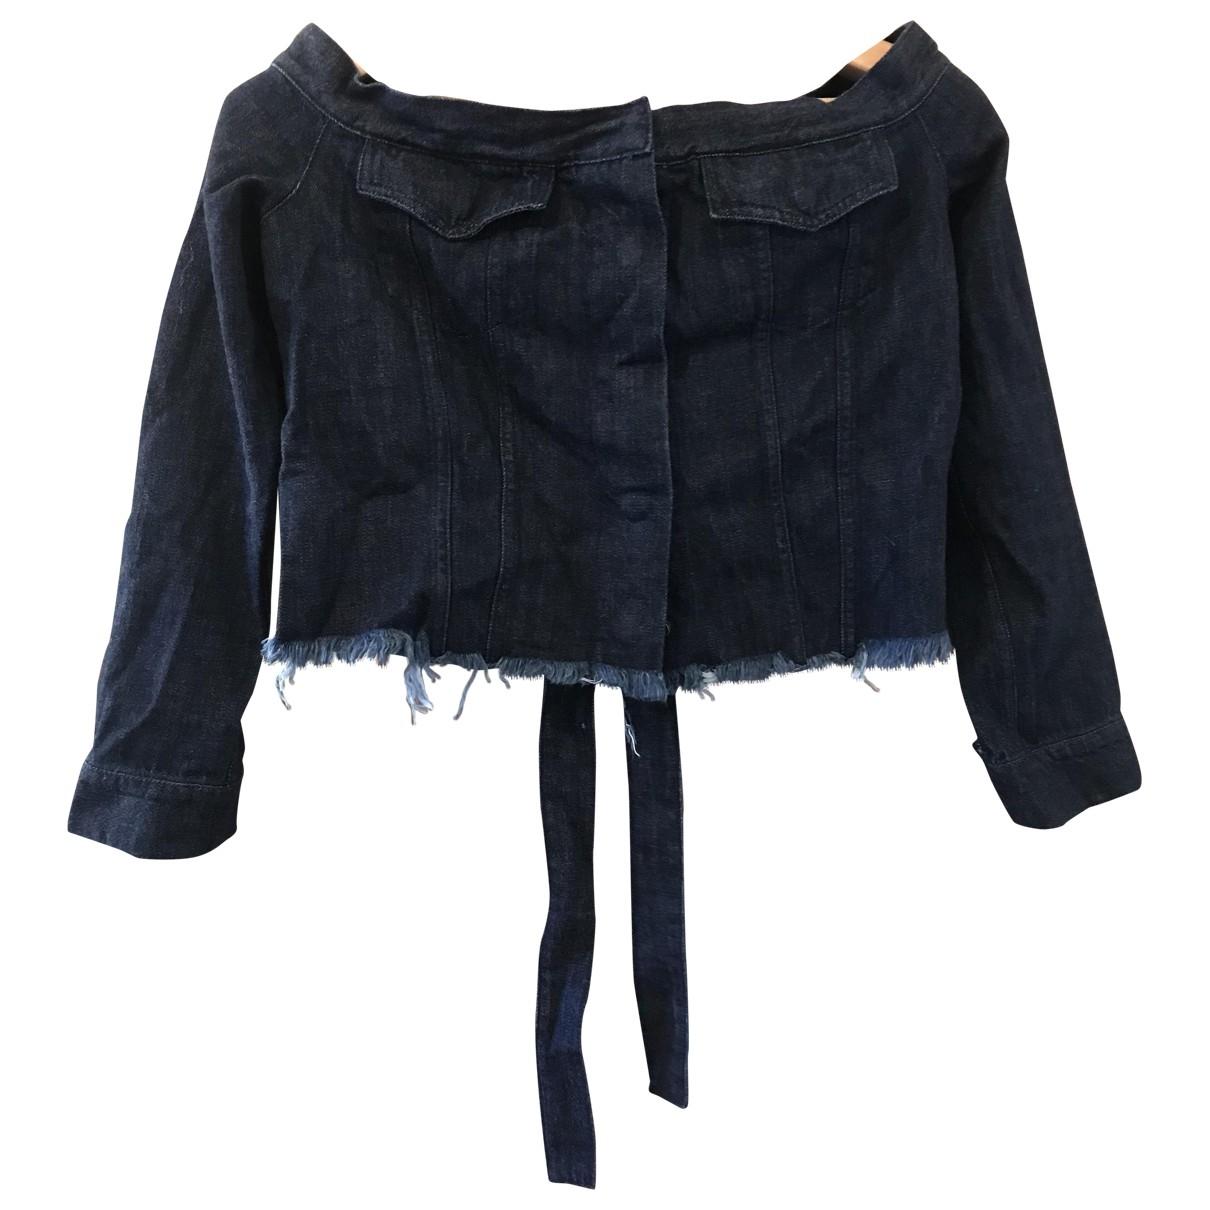 Marques Almeida \N Blue Denim - Jeans jacket for Women 8 UK